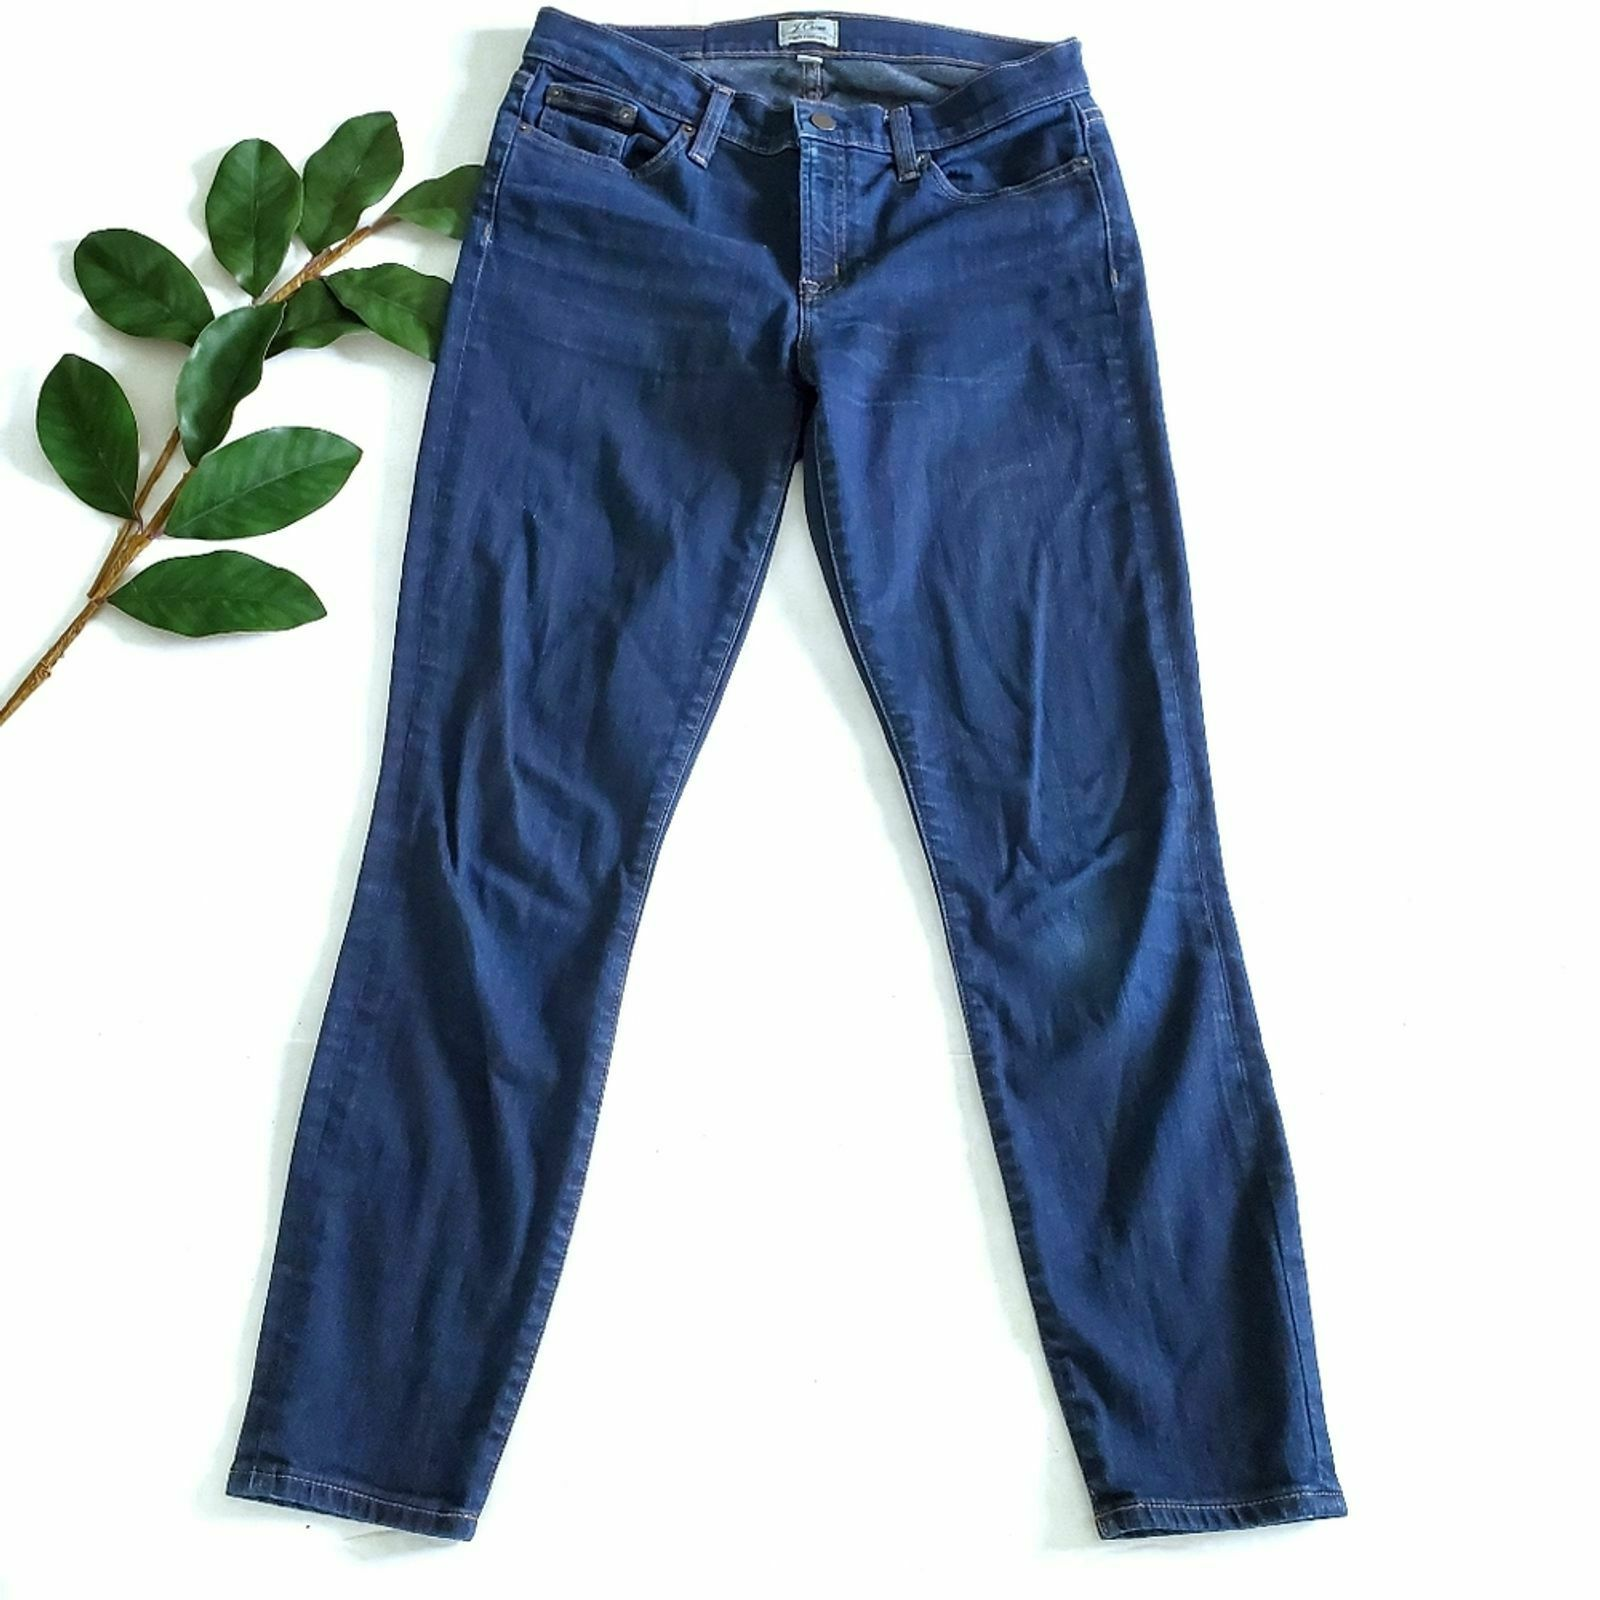 "J Crew Women 28"" Toothpick Skinny Ankle Jeans B0755 Dark Wash Size 28"